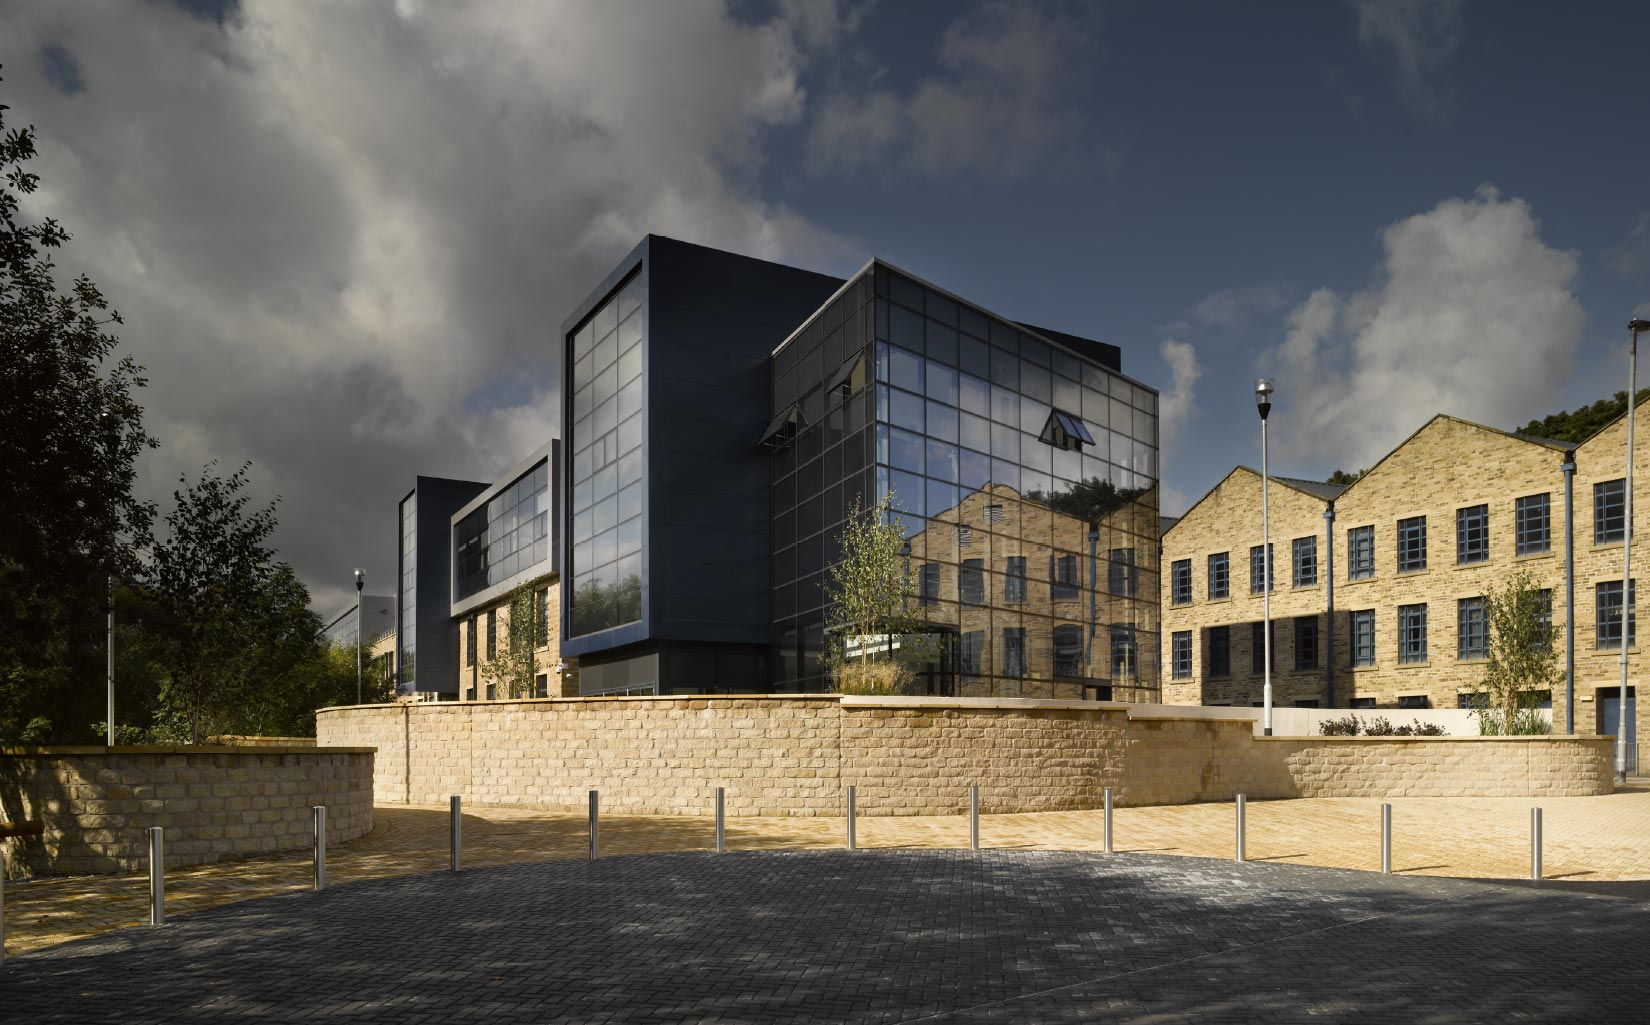 Larchfield Mills, Huddersfield University, Approach to the entrance